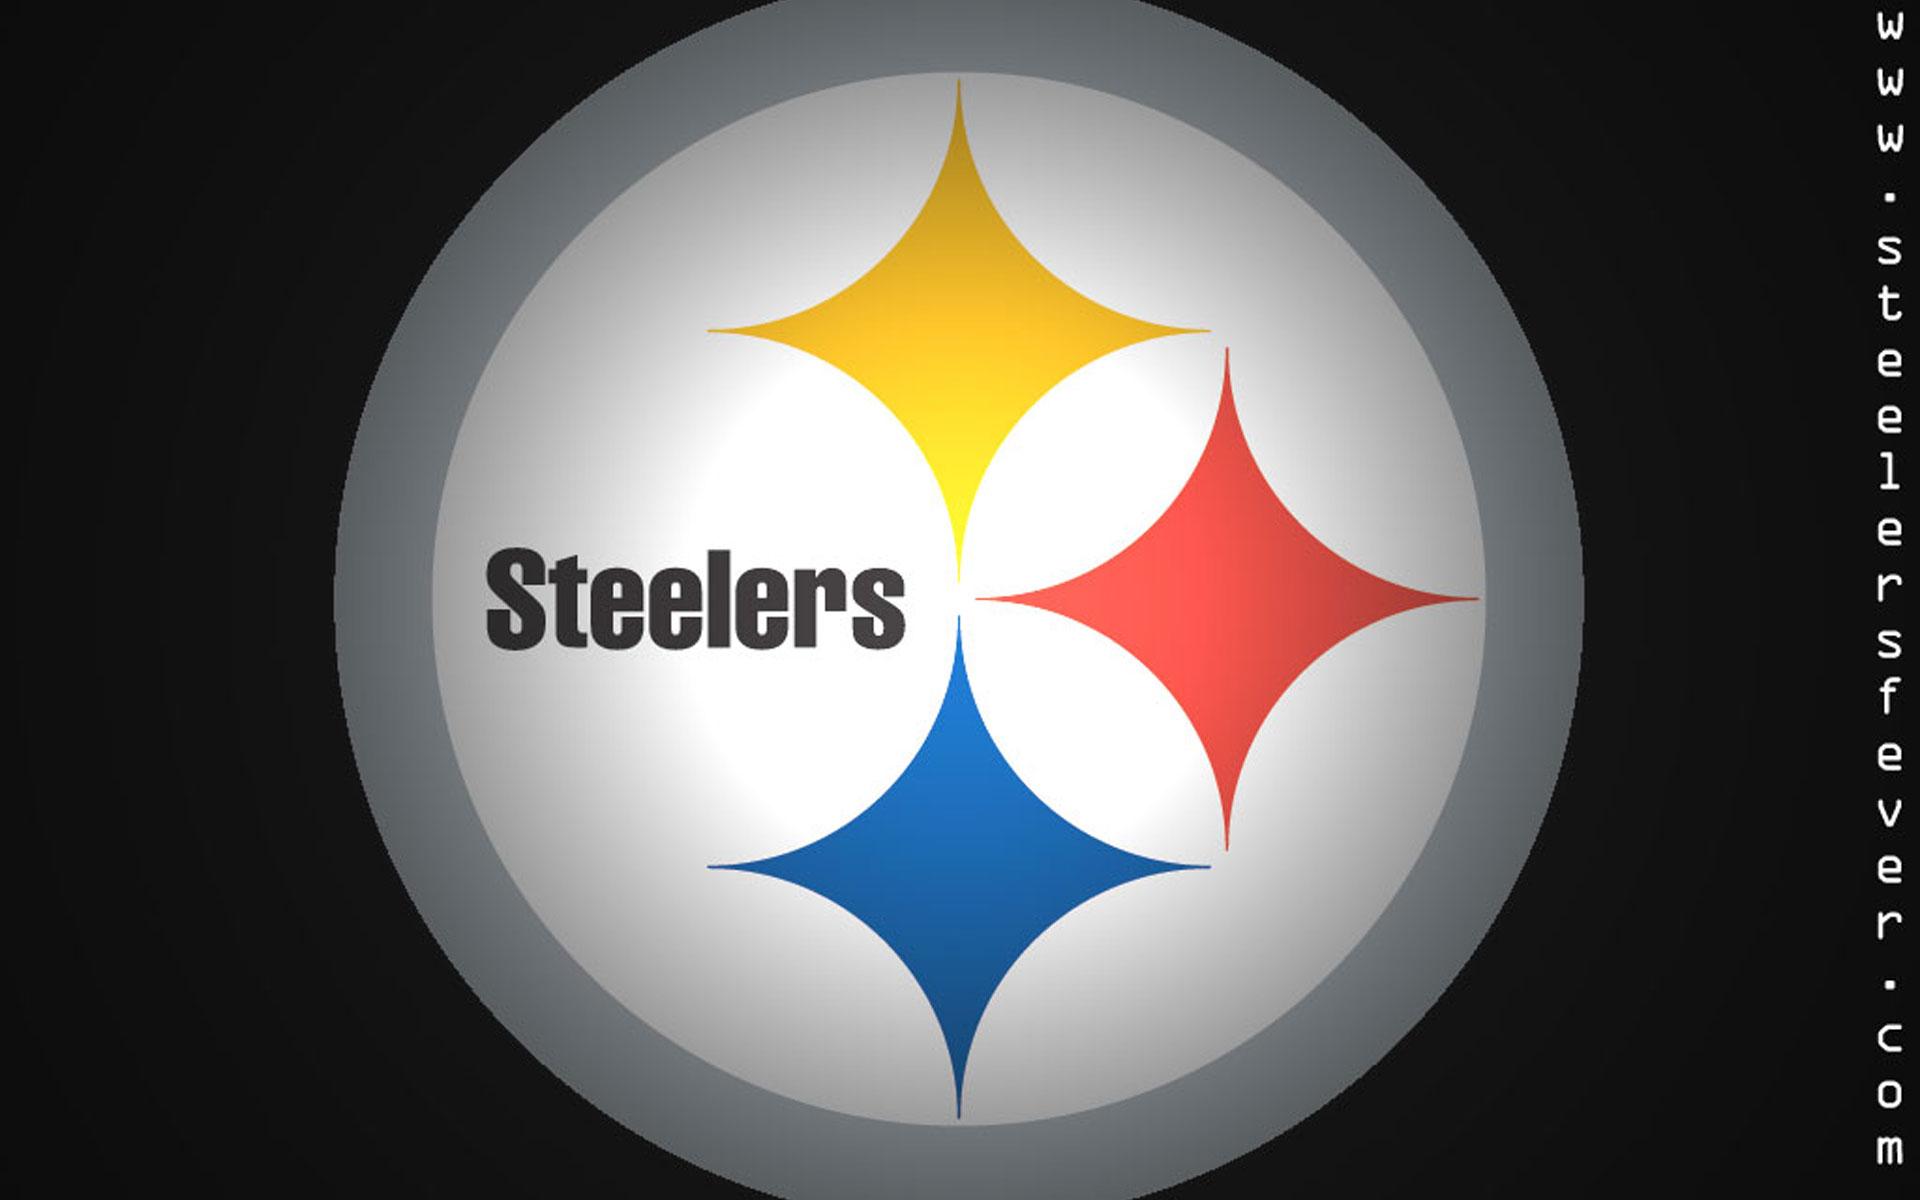 Pittsburgh steelers logo clipart free jpg black and white Free Pittsburgh Steelers Logo, Download Free Clip Art, Free ... jpg black and white